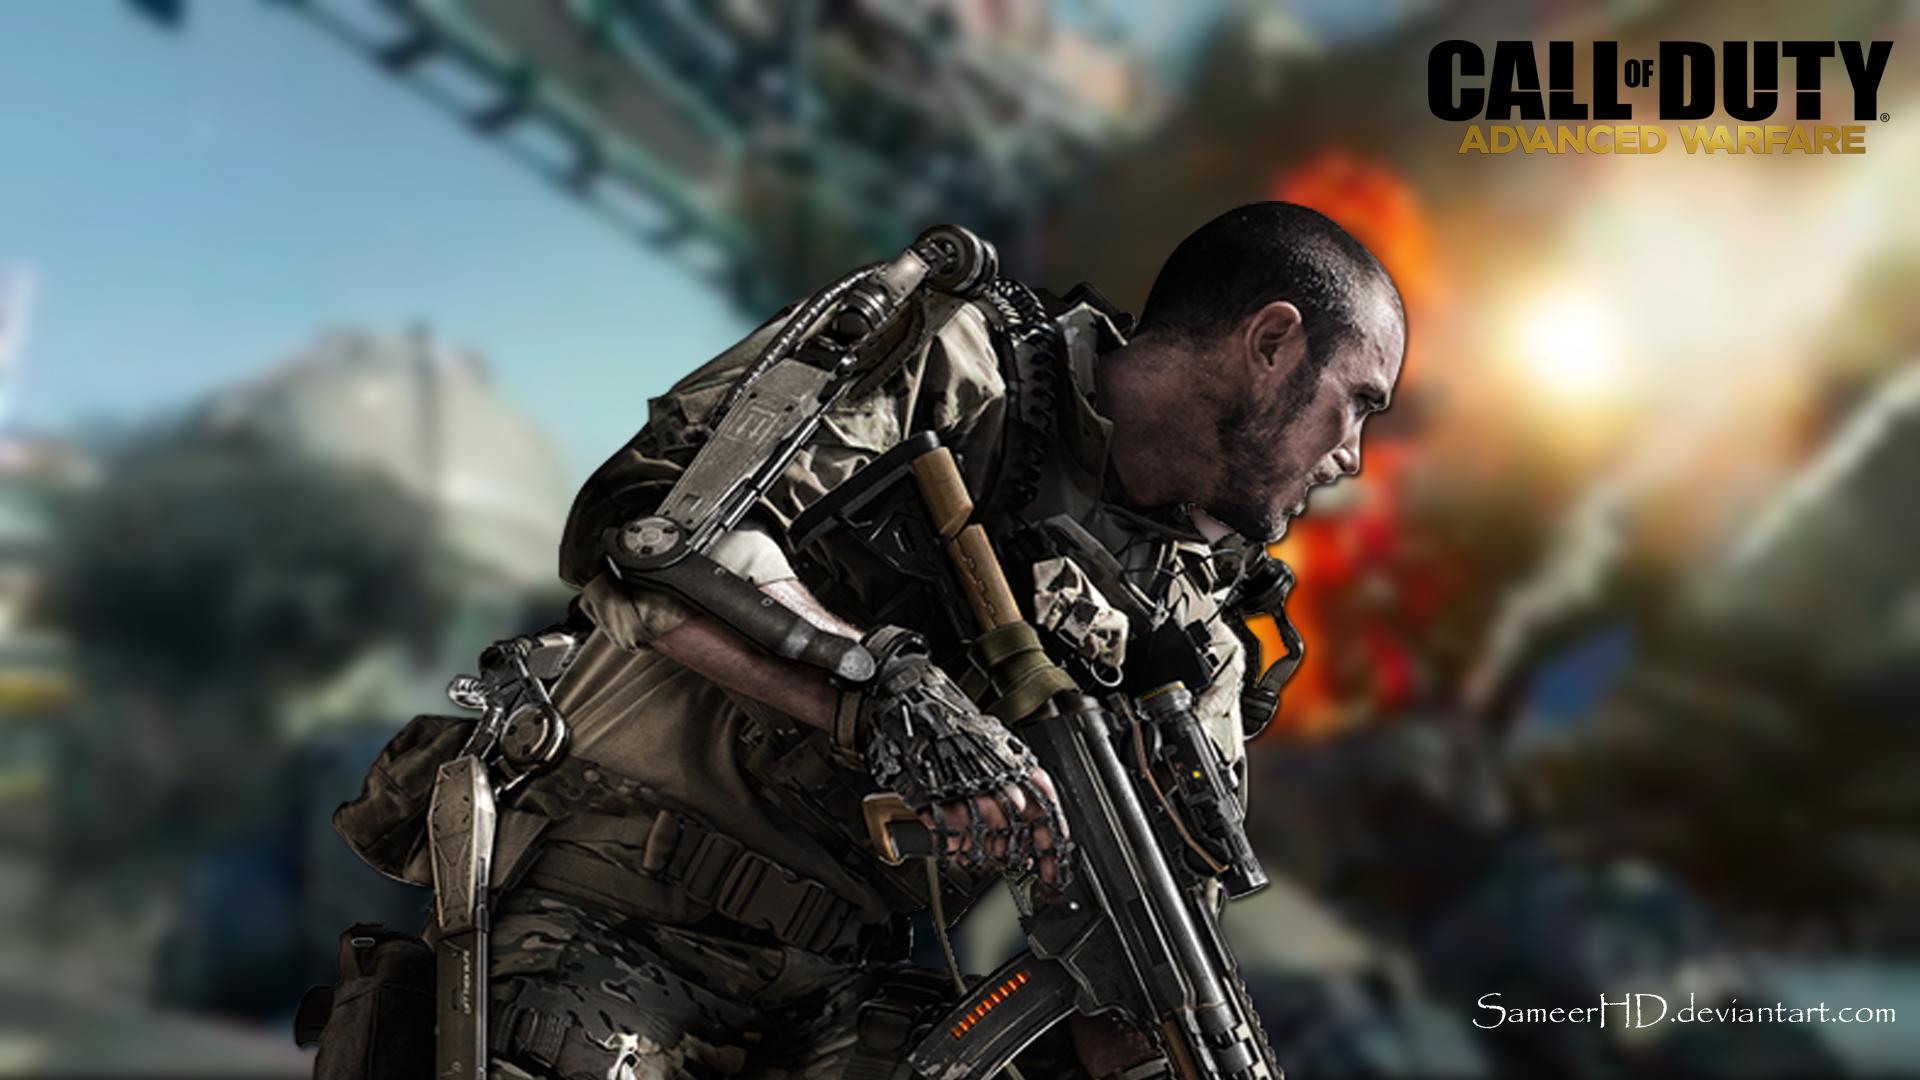 Call Of Duty Advanced Warfare Soldier Wallpaper By Sameerhd On Deviantart